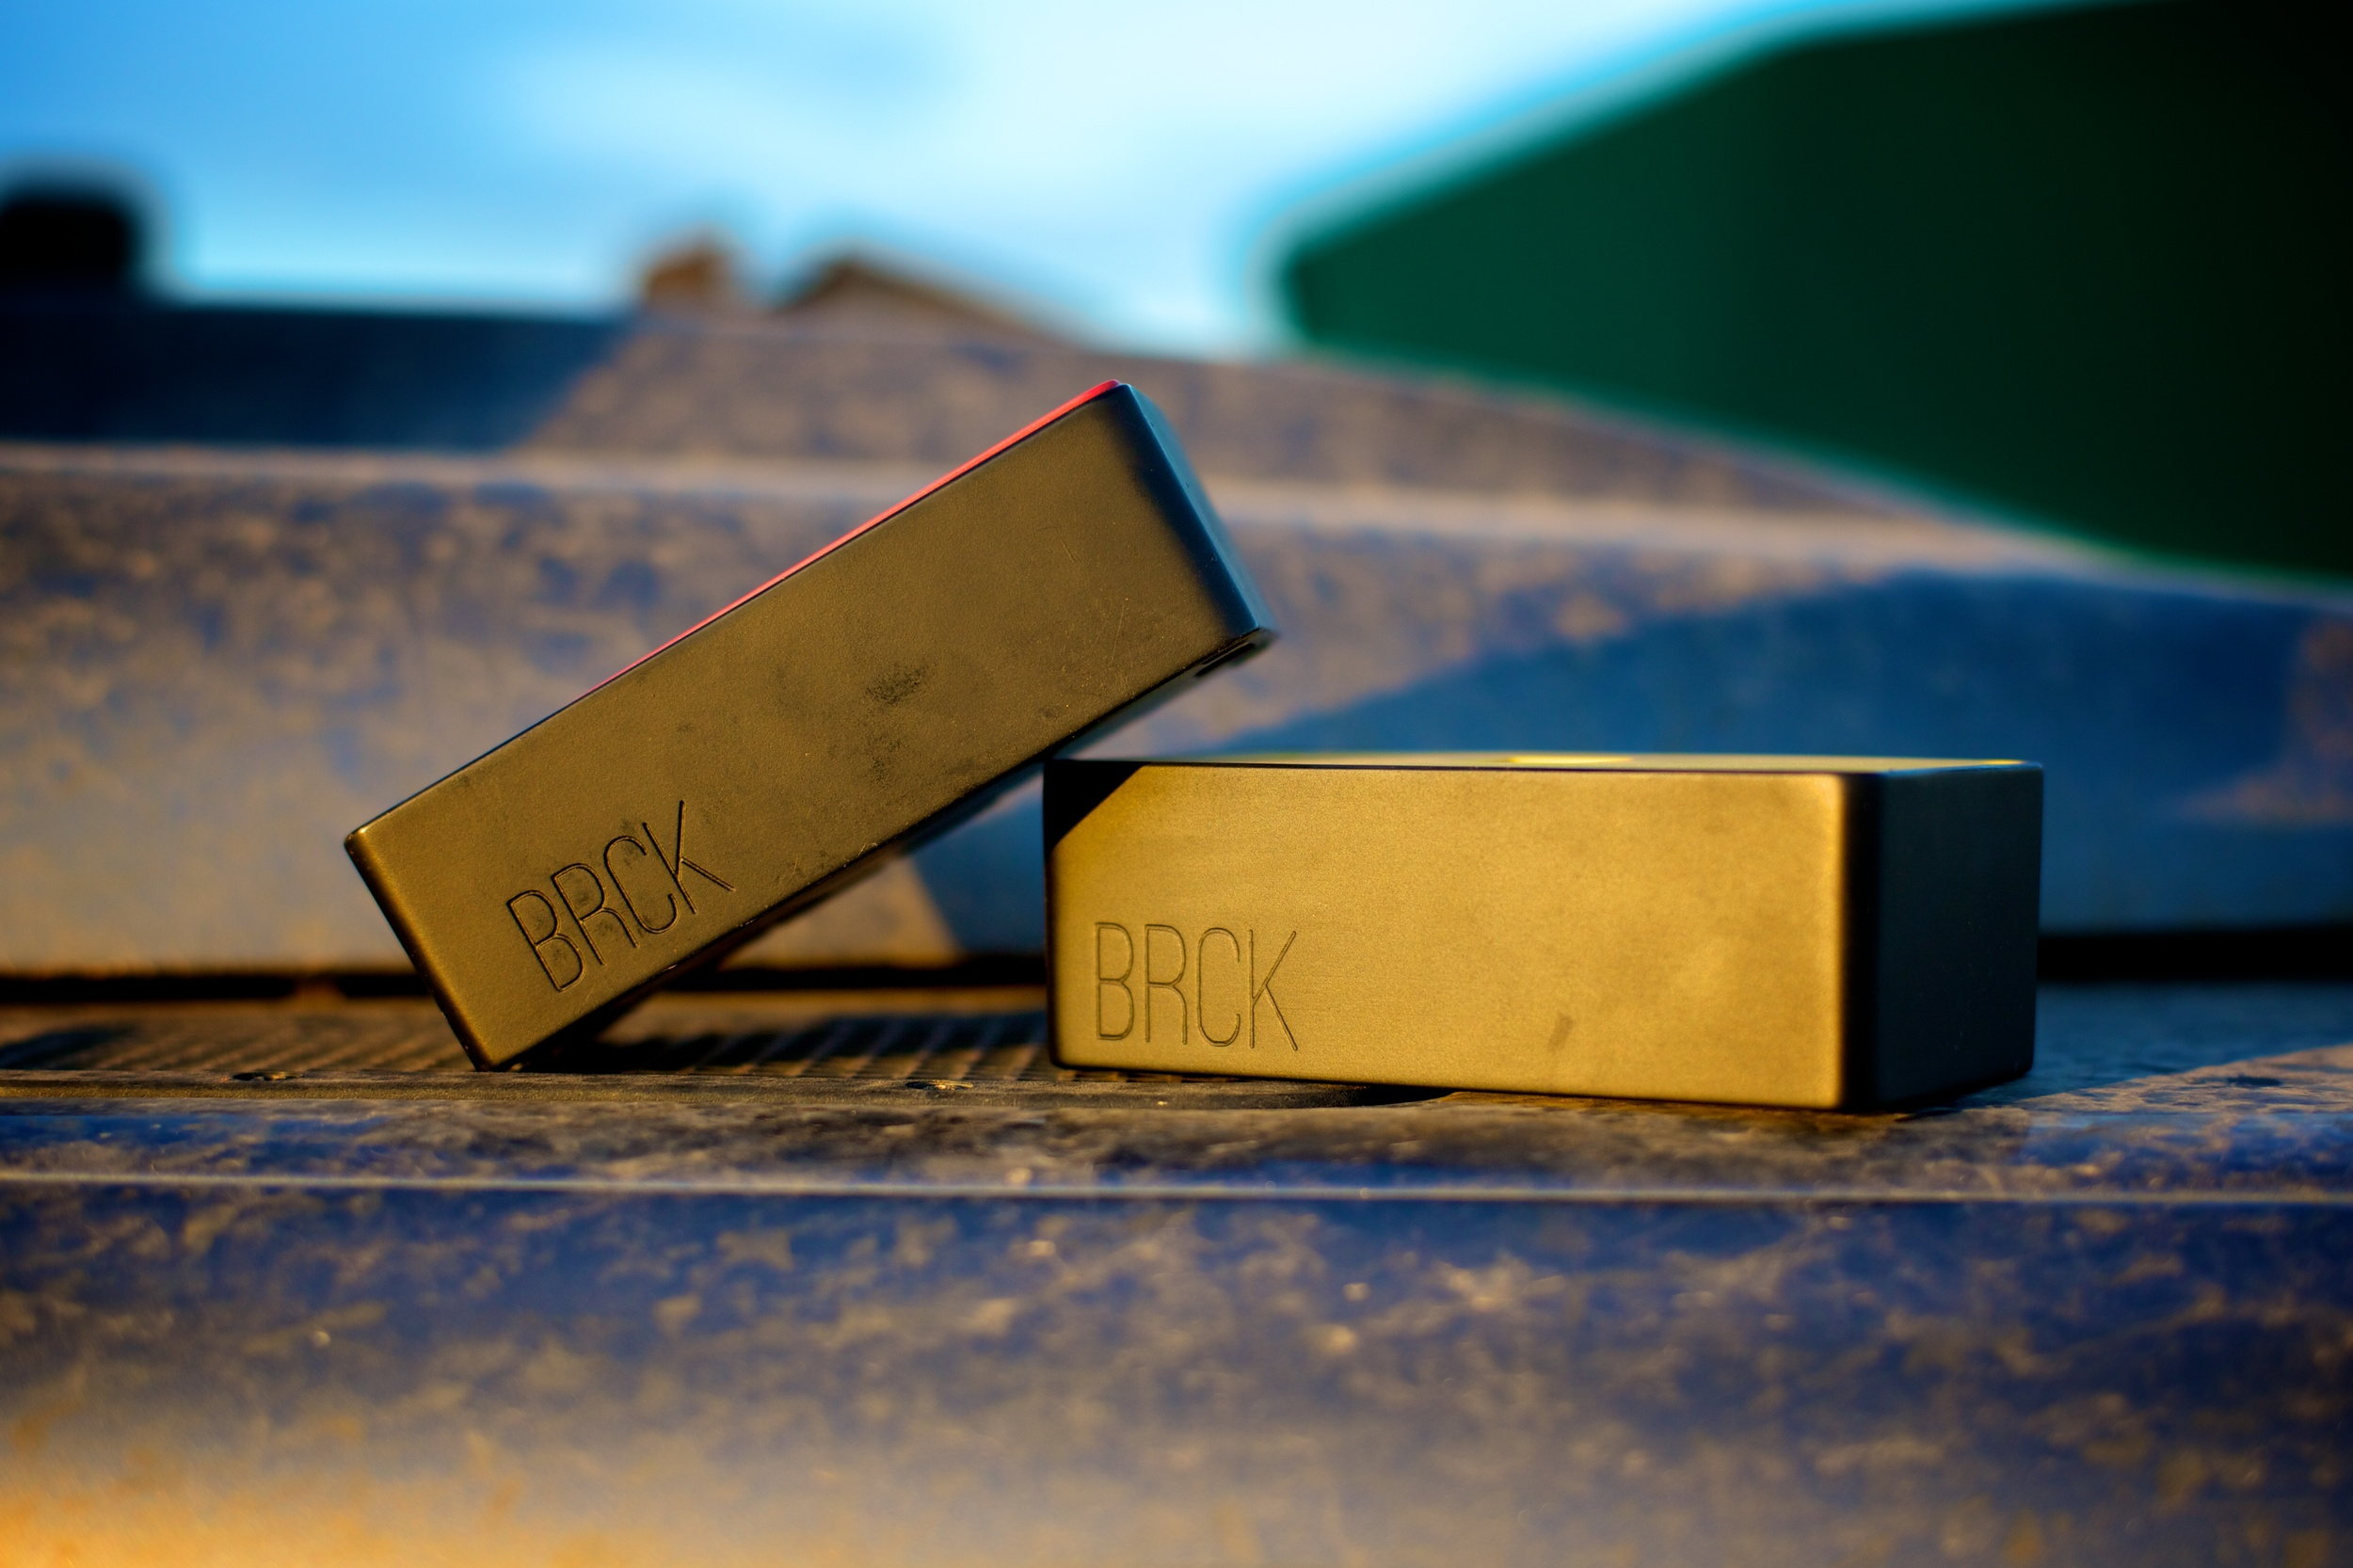 BRCK 4.jpg